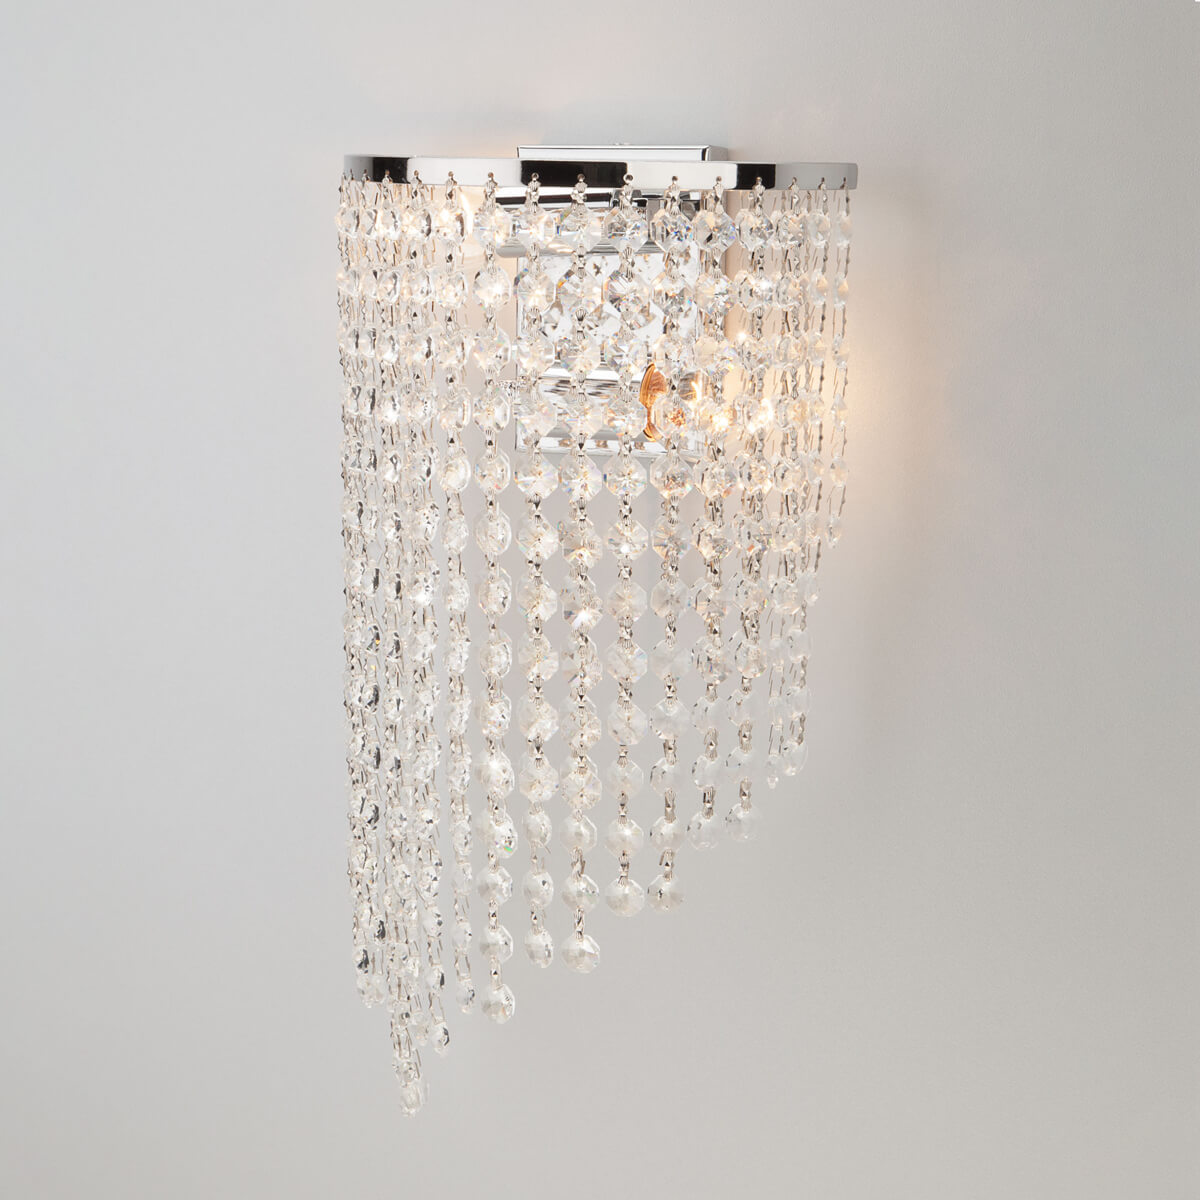 Светильник Eurosvet 3102/2 хром/прозрачный хрусталь Strotskis 3102